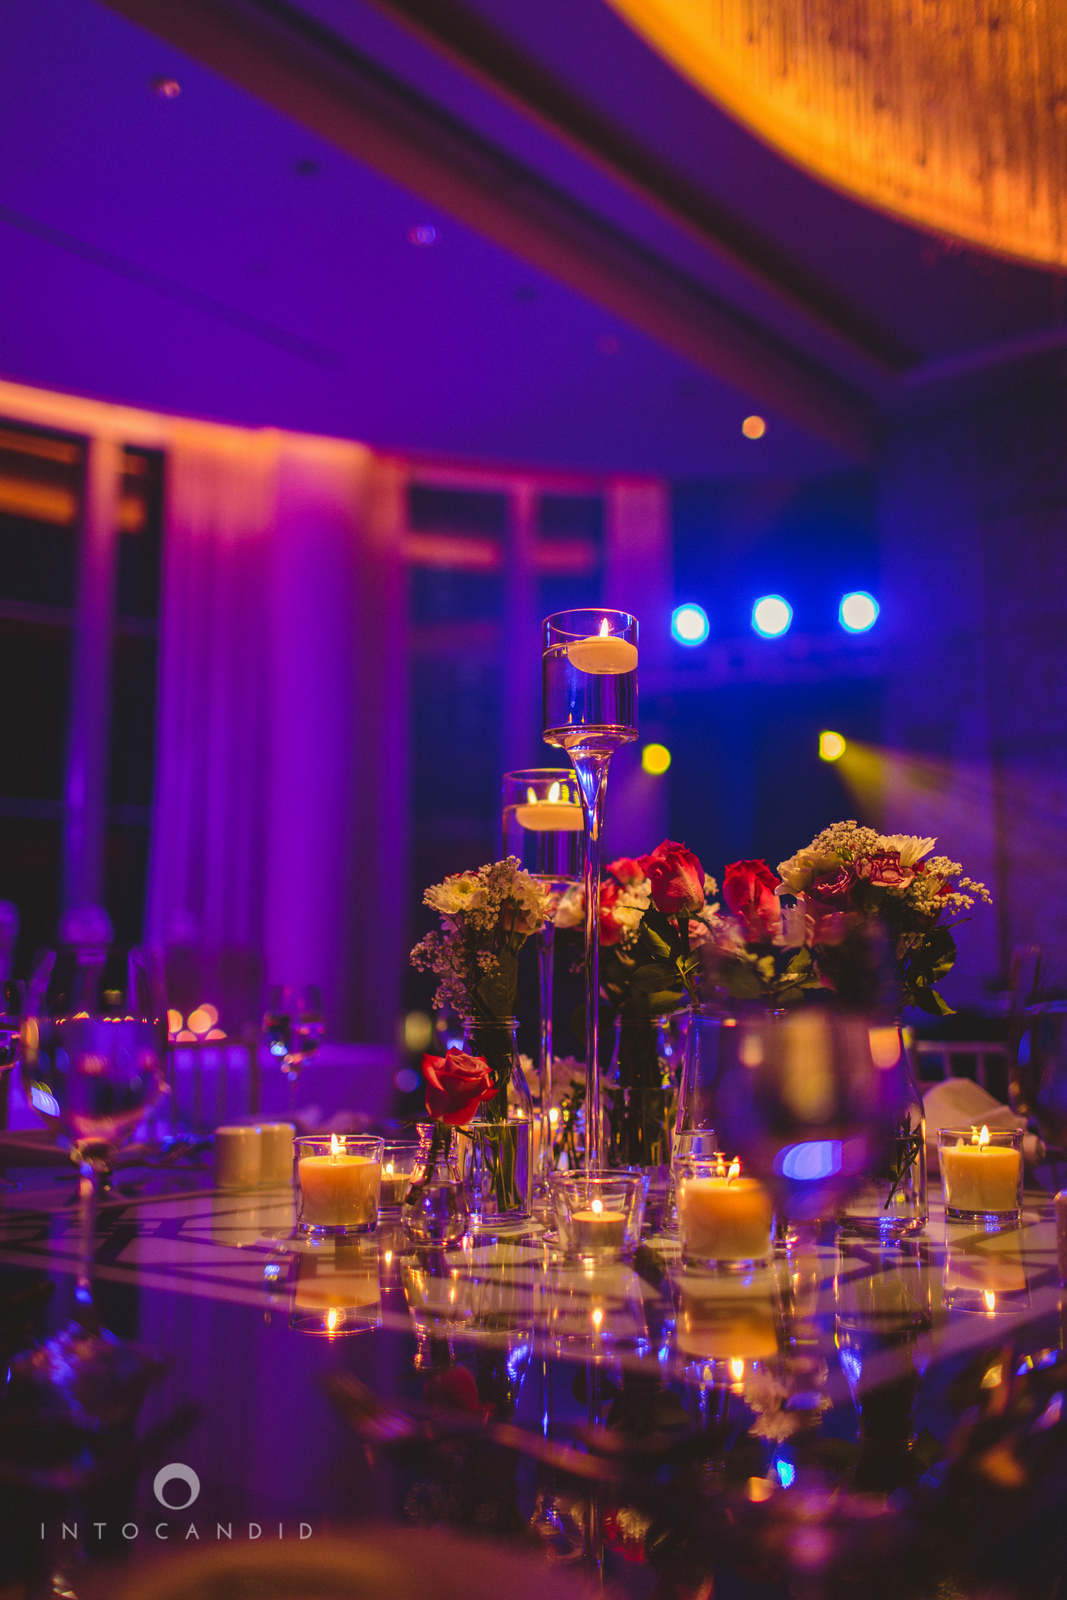 dubai-01-wedding-reception-photographers-theaddress-downtown-dubai-intocandid-photography1751.jpg